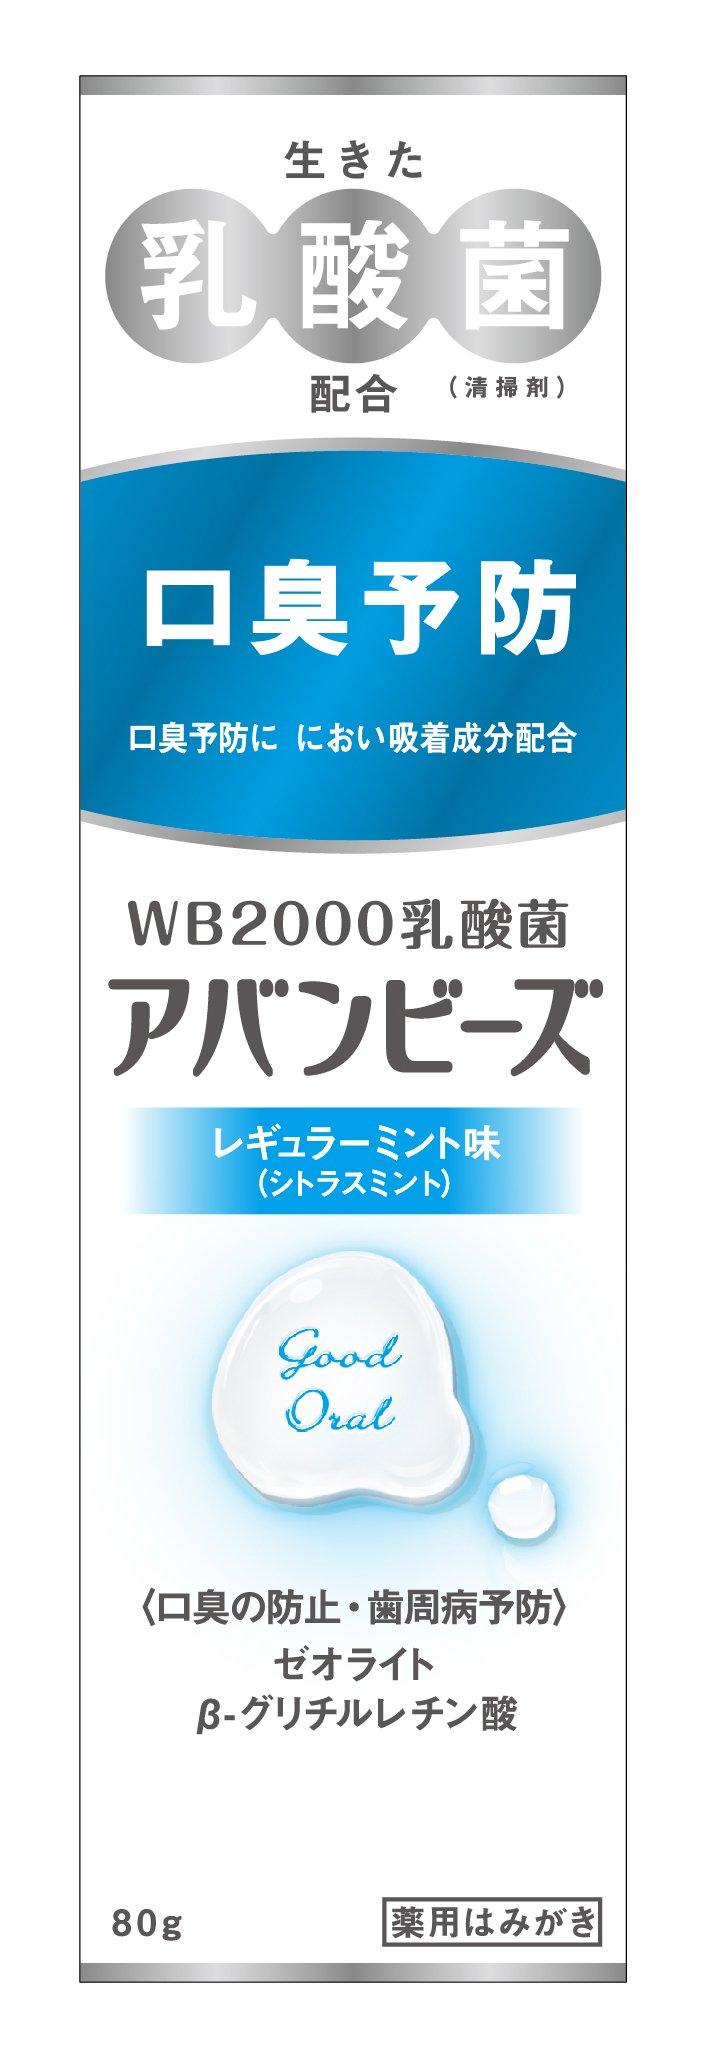 Wakamoto Pharmacy Avantbise 80g Toothpaste 1 Count Regular Mint by Avantbise